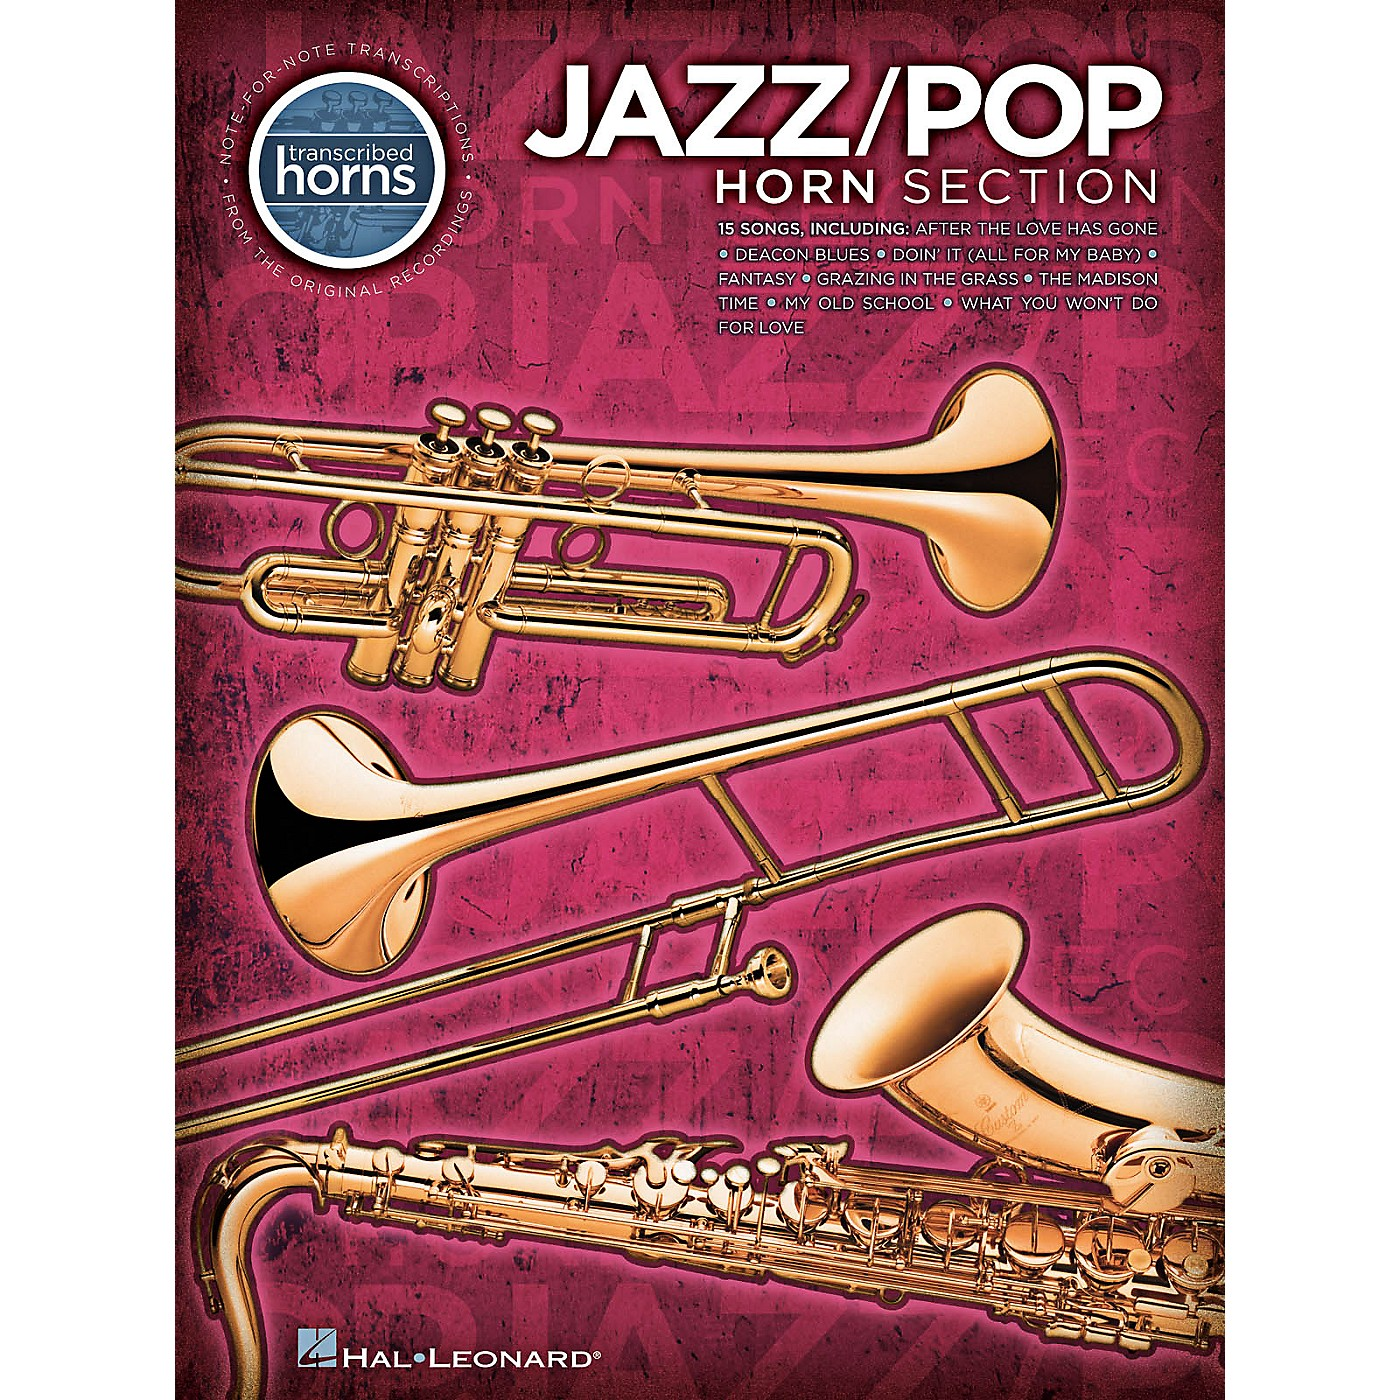 Hal Leonard Jazz/Pop Horn Section - Transcribed Horn Songbook thumbnail